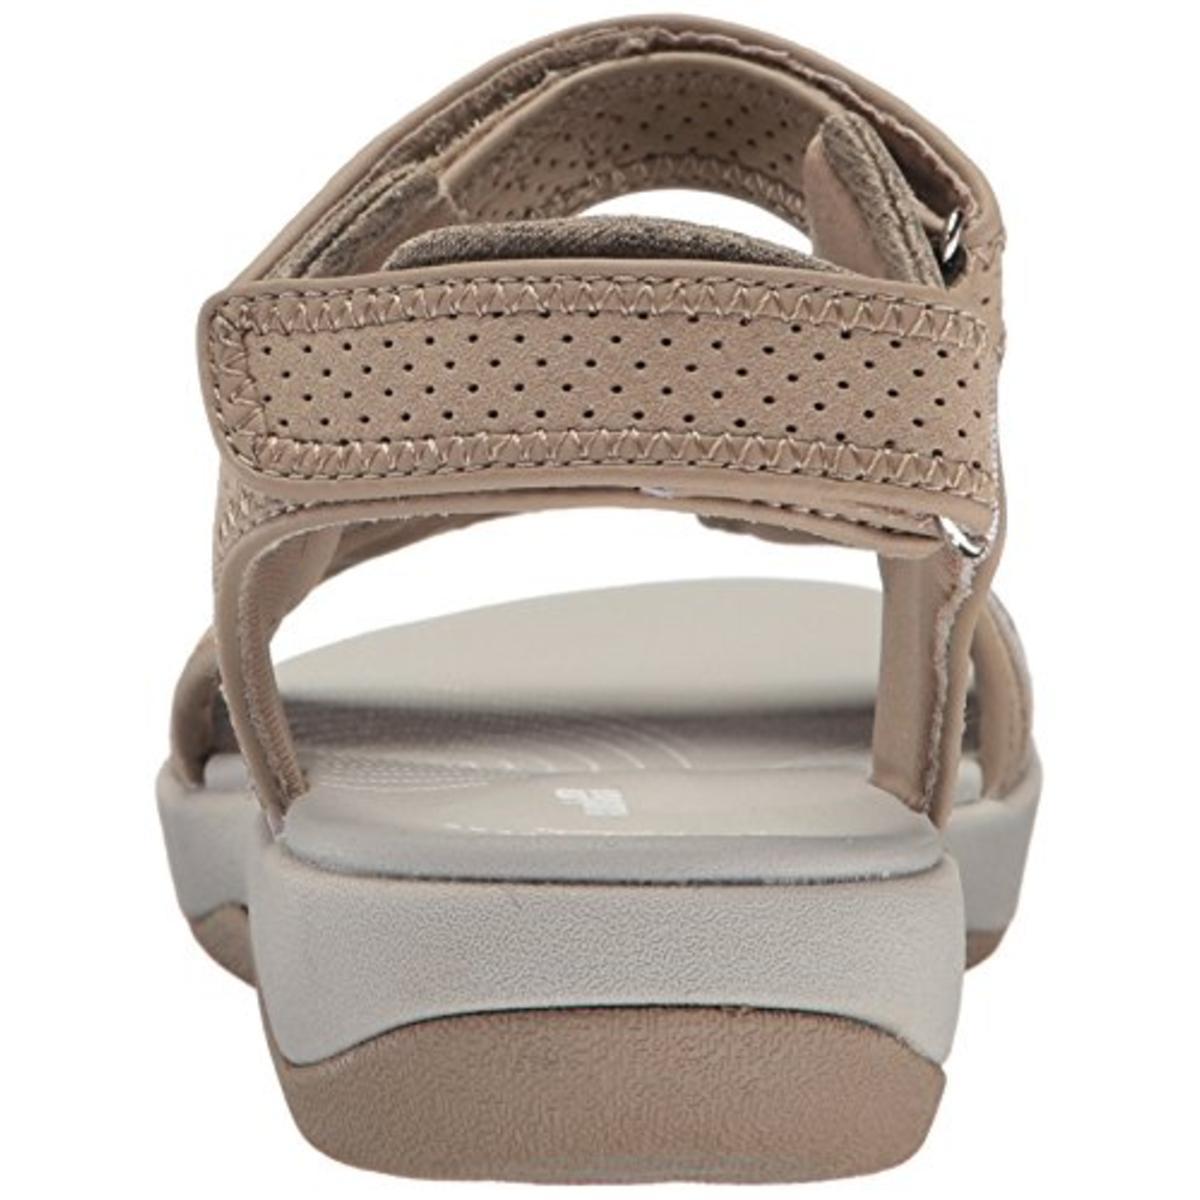 bfc28c8cc63 Clarks Brizo Sammie Womens Laser Cut Gladiator Flat Sandals